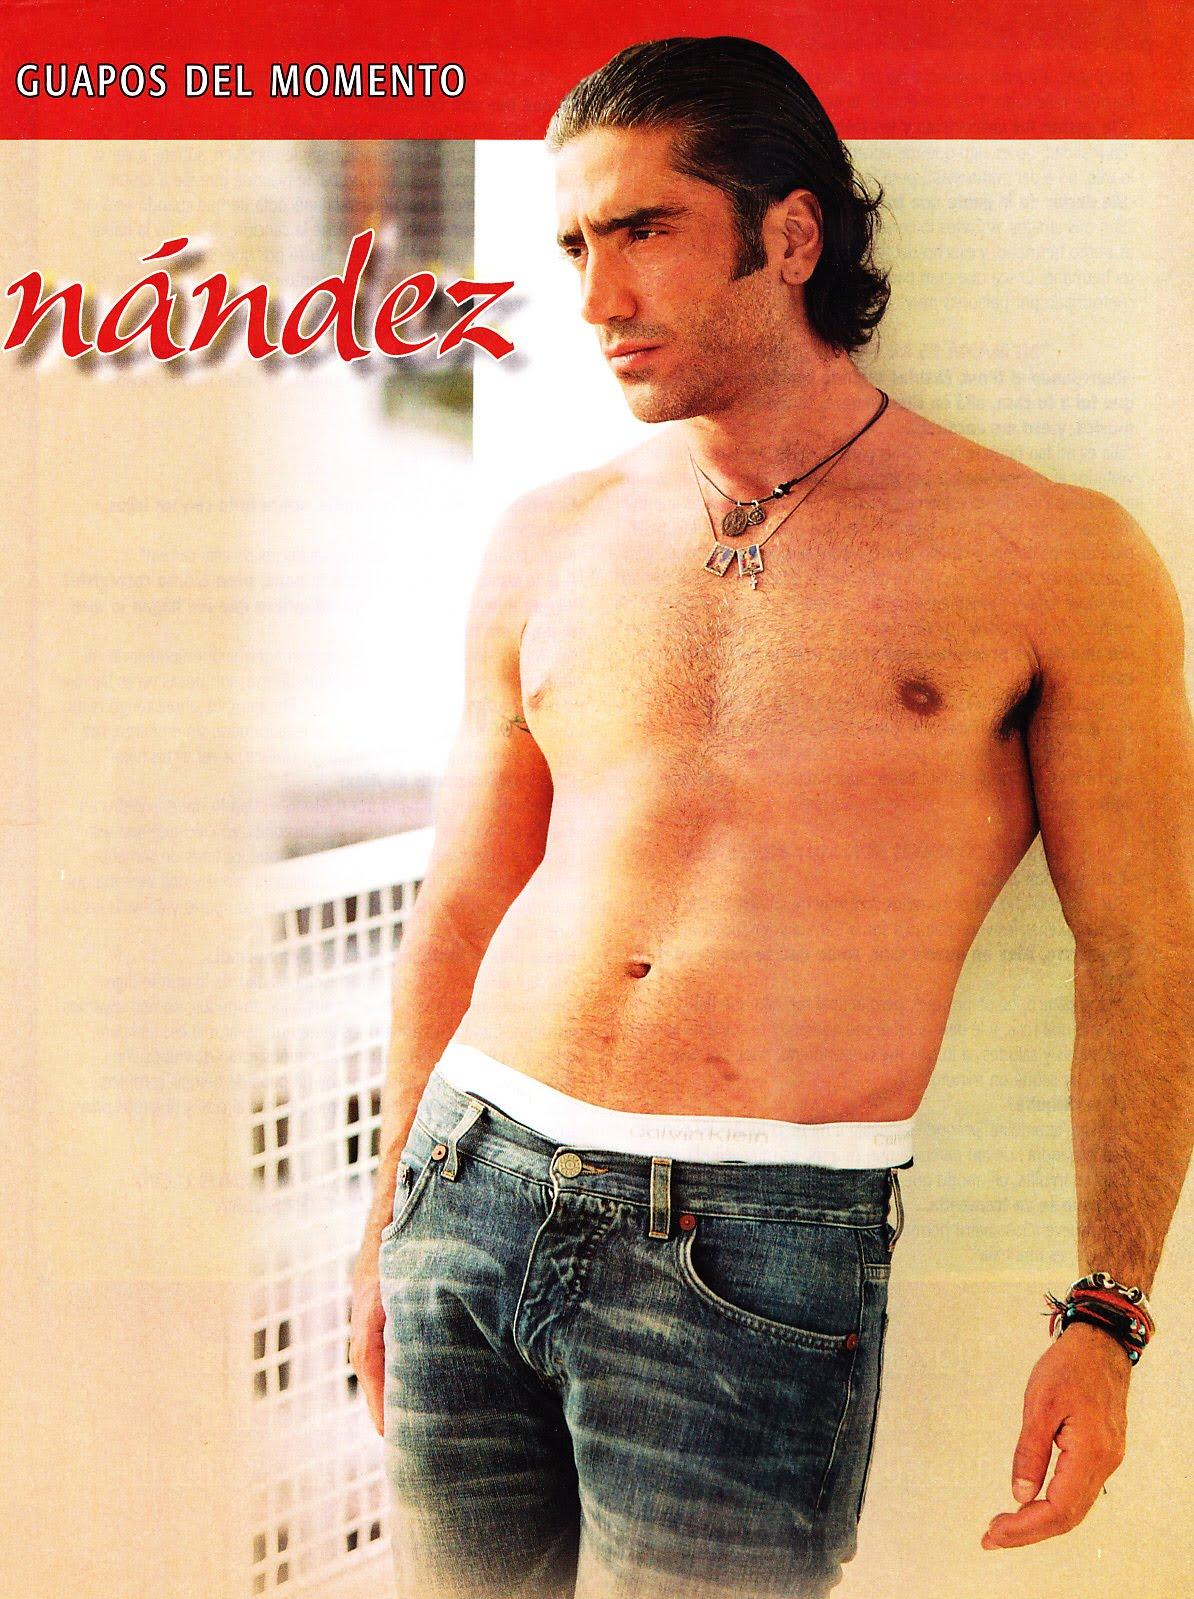 naked picture of alejandro fernandez